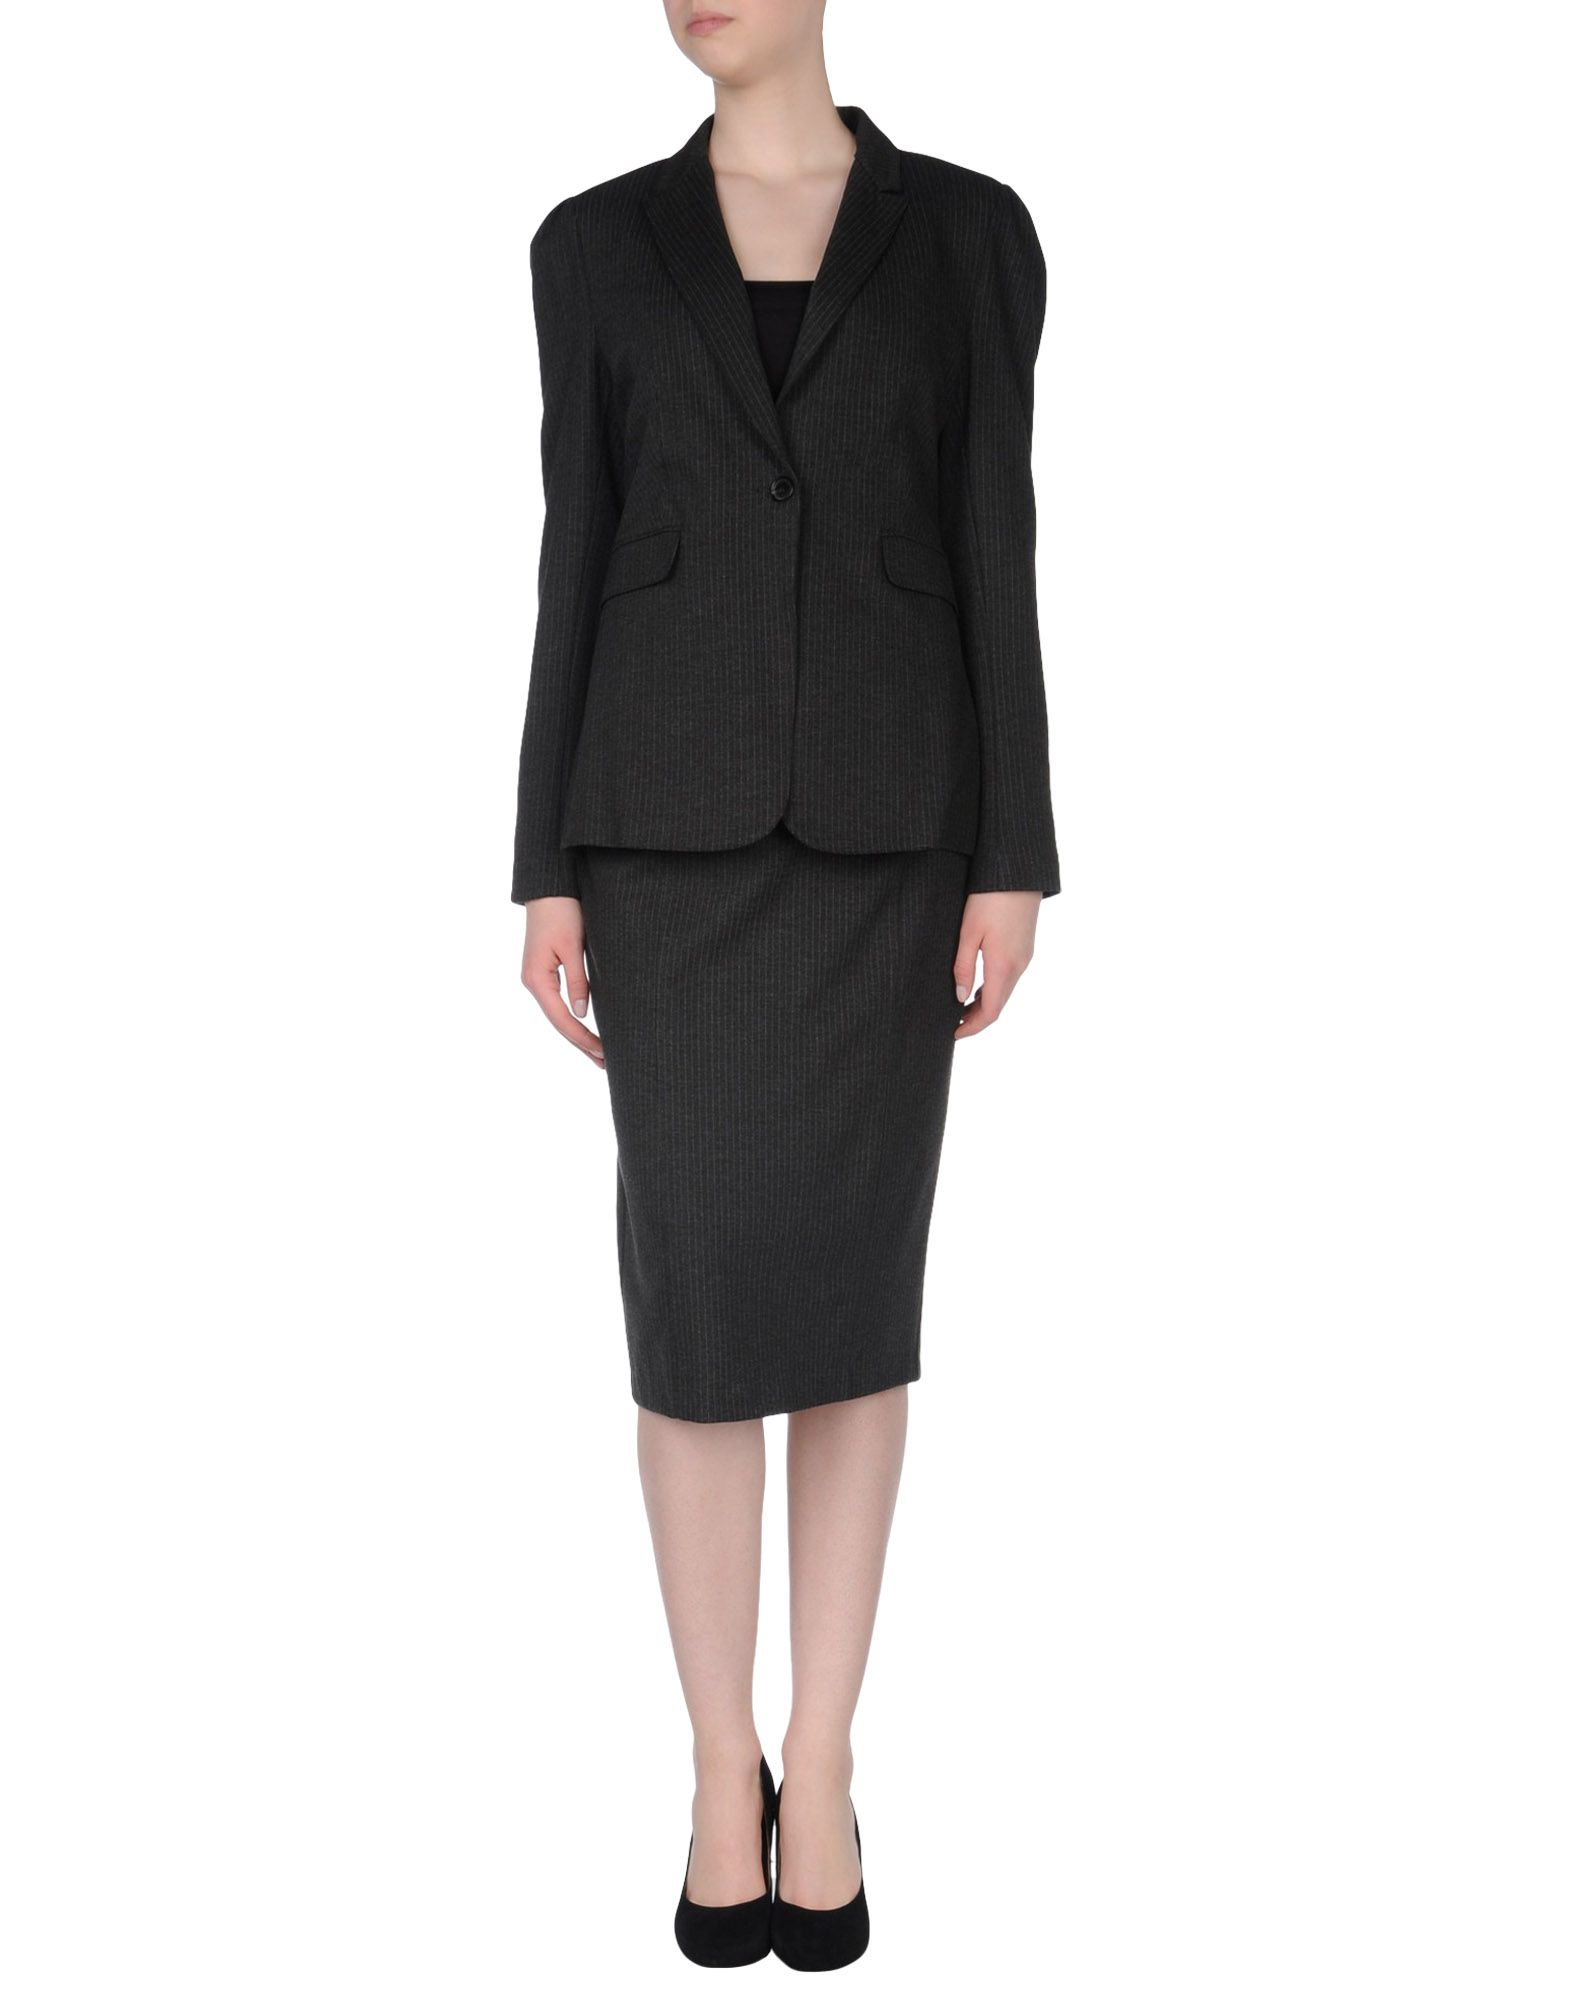 burberry womens skirt suit in gray steel grey lyst